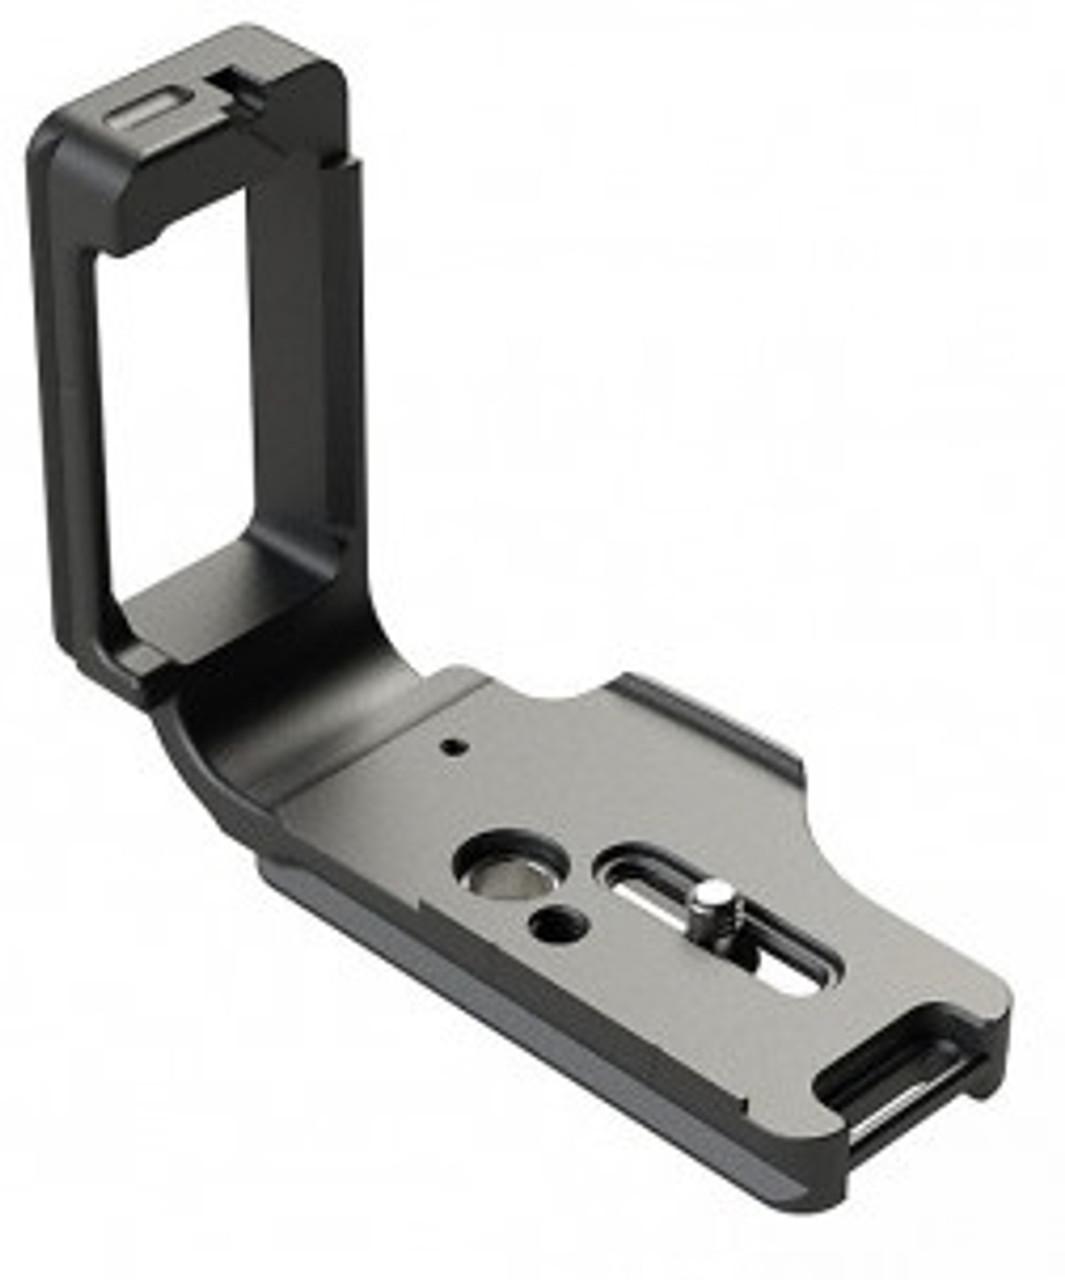 Kirk Enterprises L-Bracket for Nikon D850